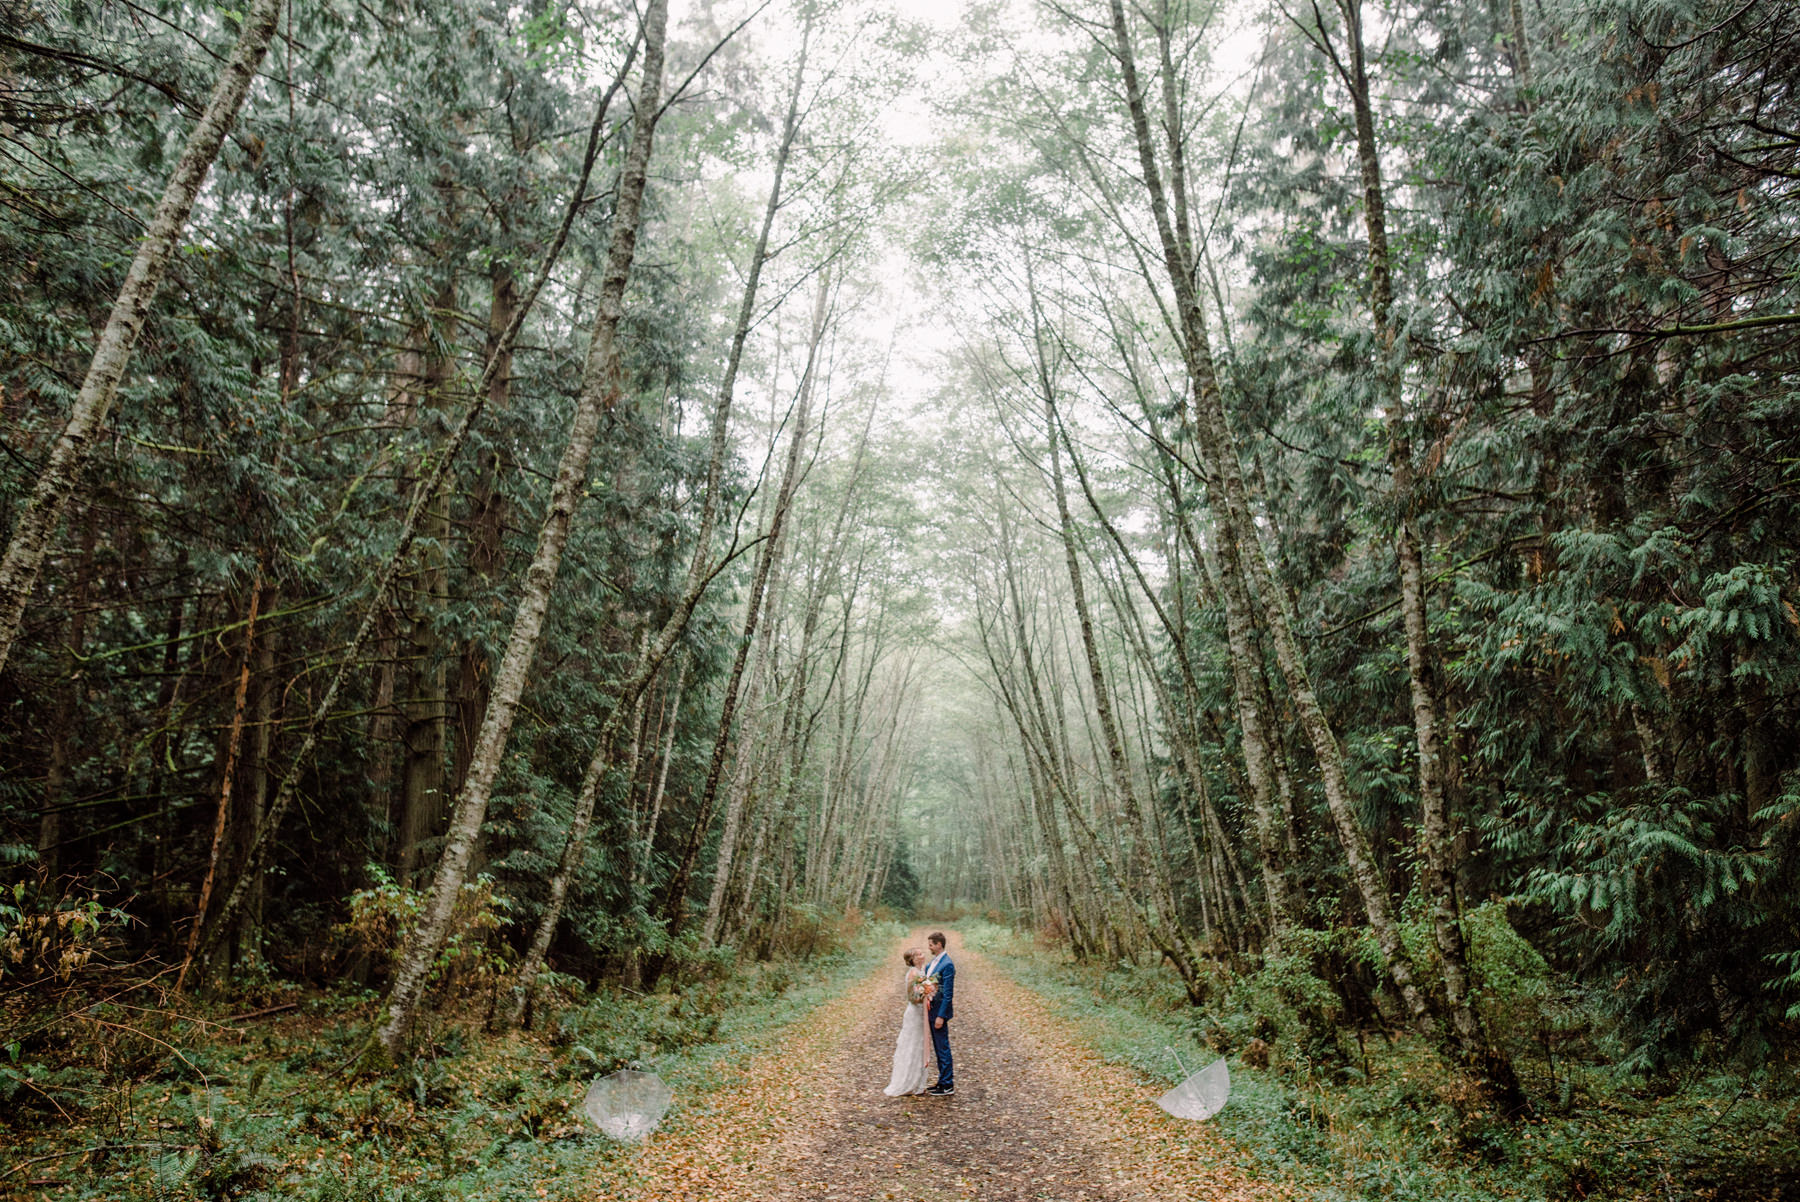 292-colorful-outdoor-lopez-island-wedding.jpg